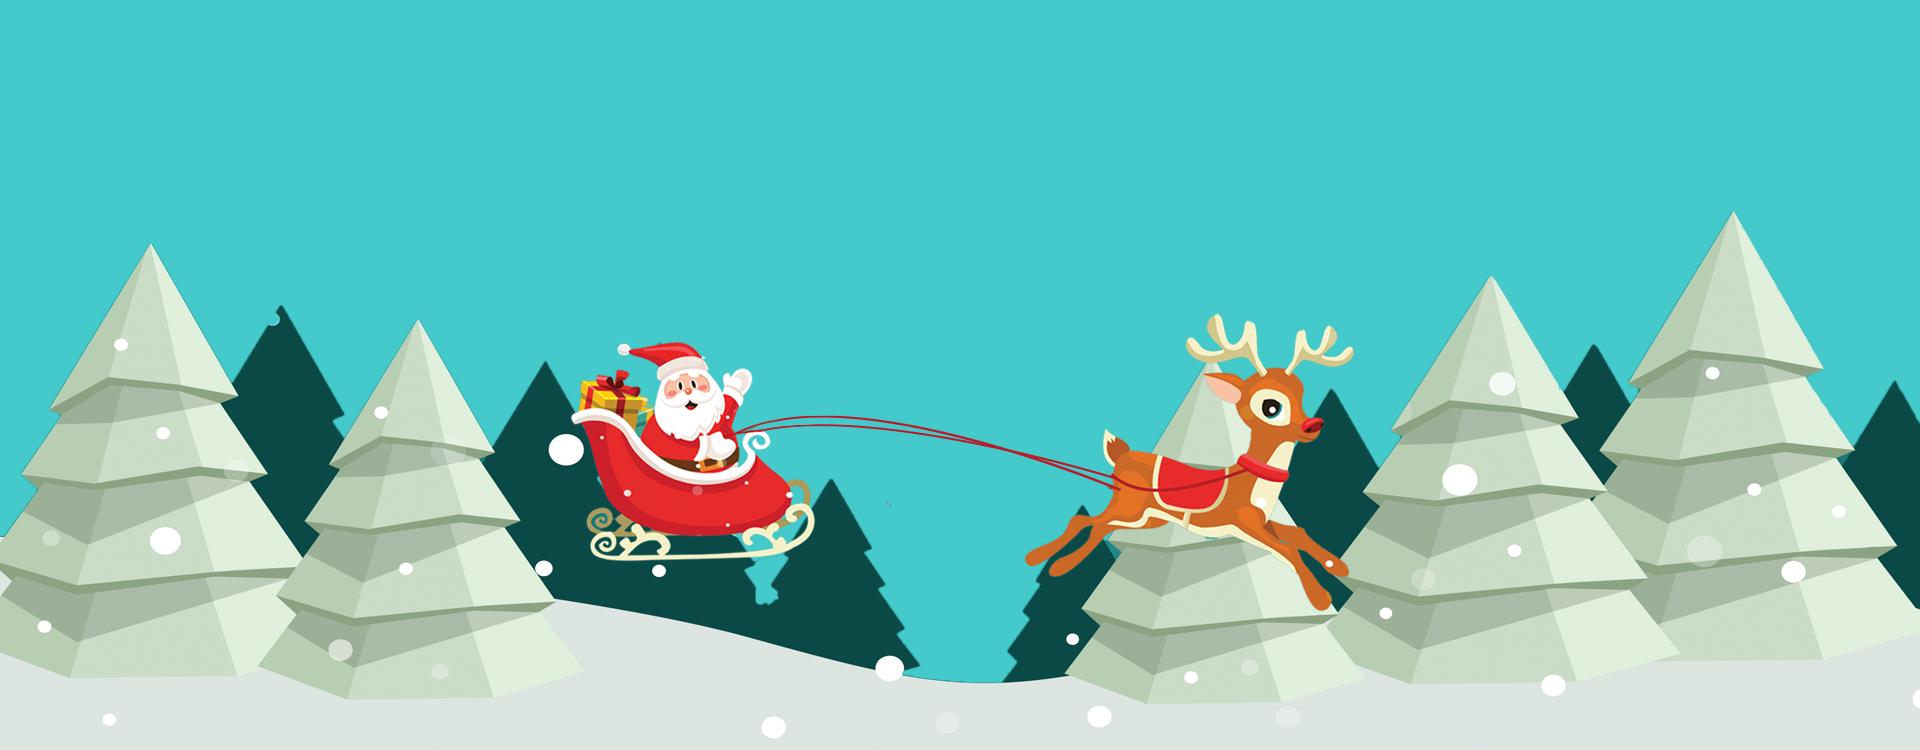 Create Payoneer Holiday Greeting Card Gain Exposure And Win